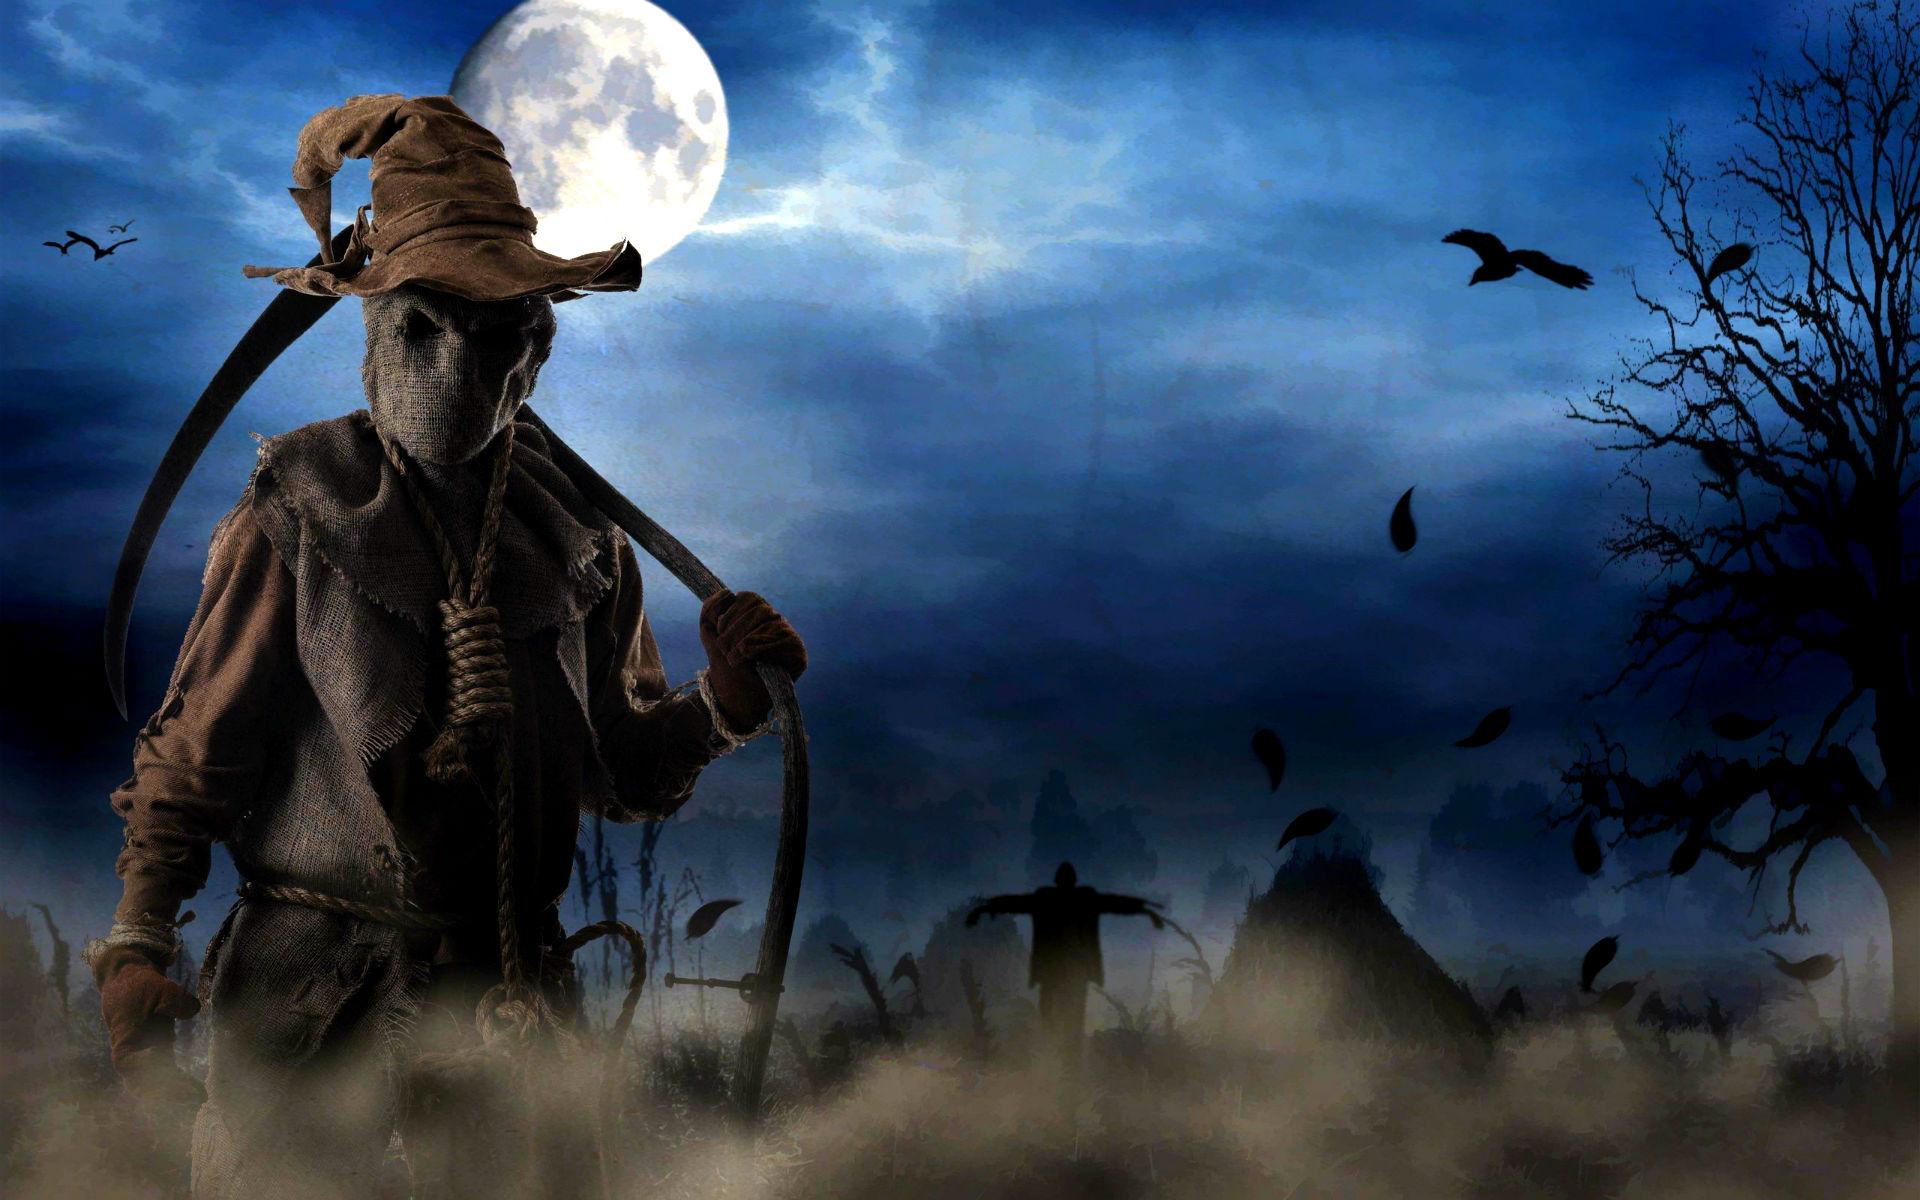 47] Scary Halloween Wallpaper Downloads on WallpaperSafari 1920x1200